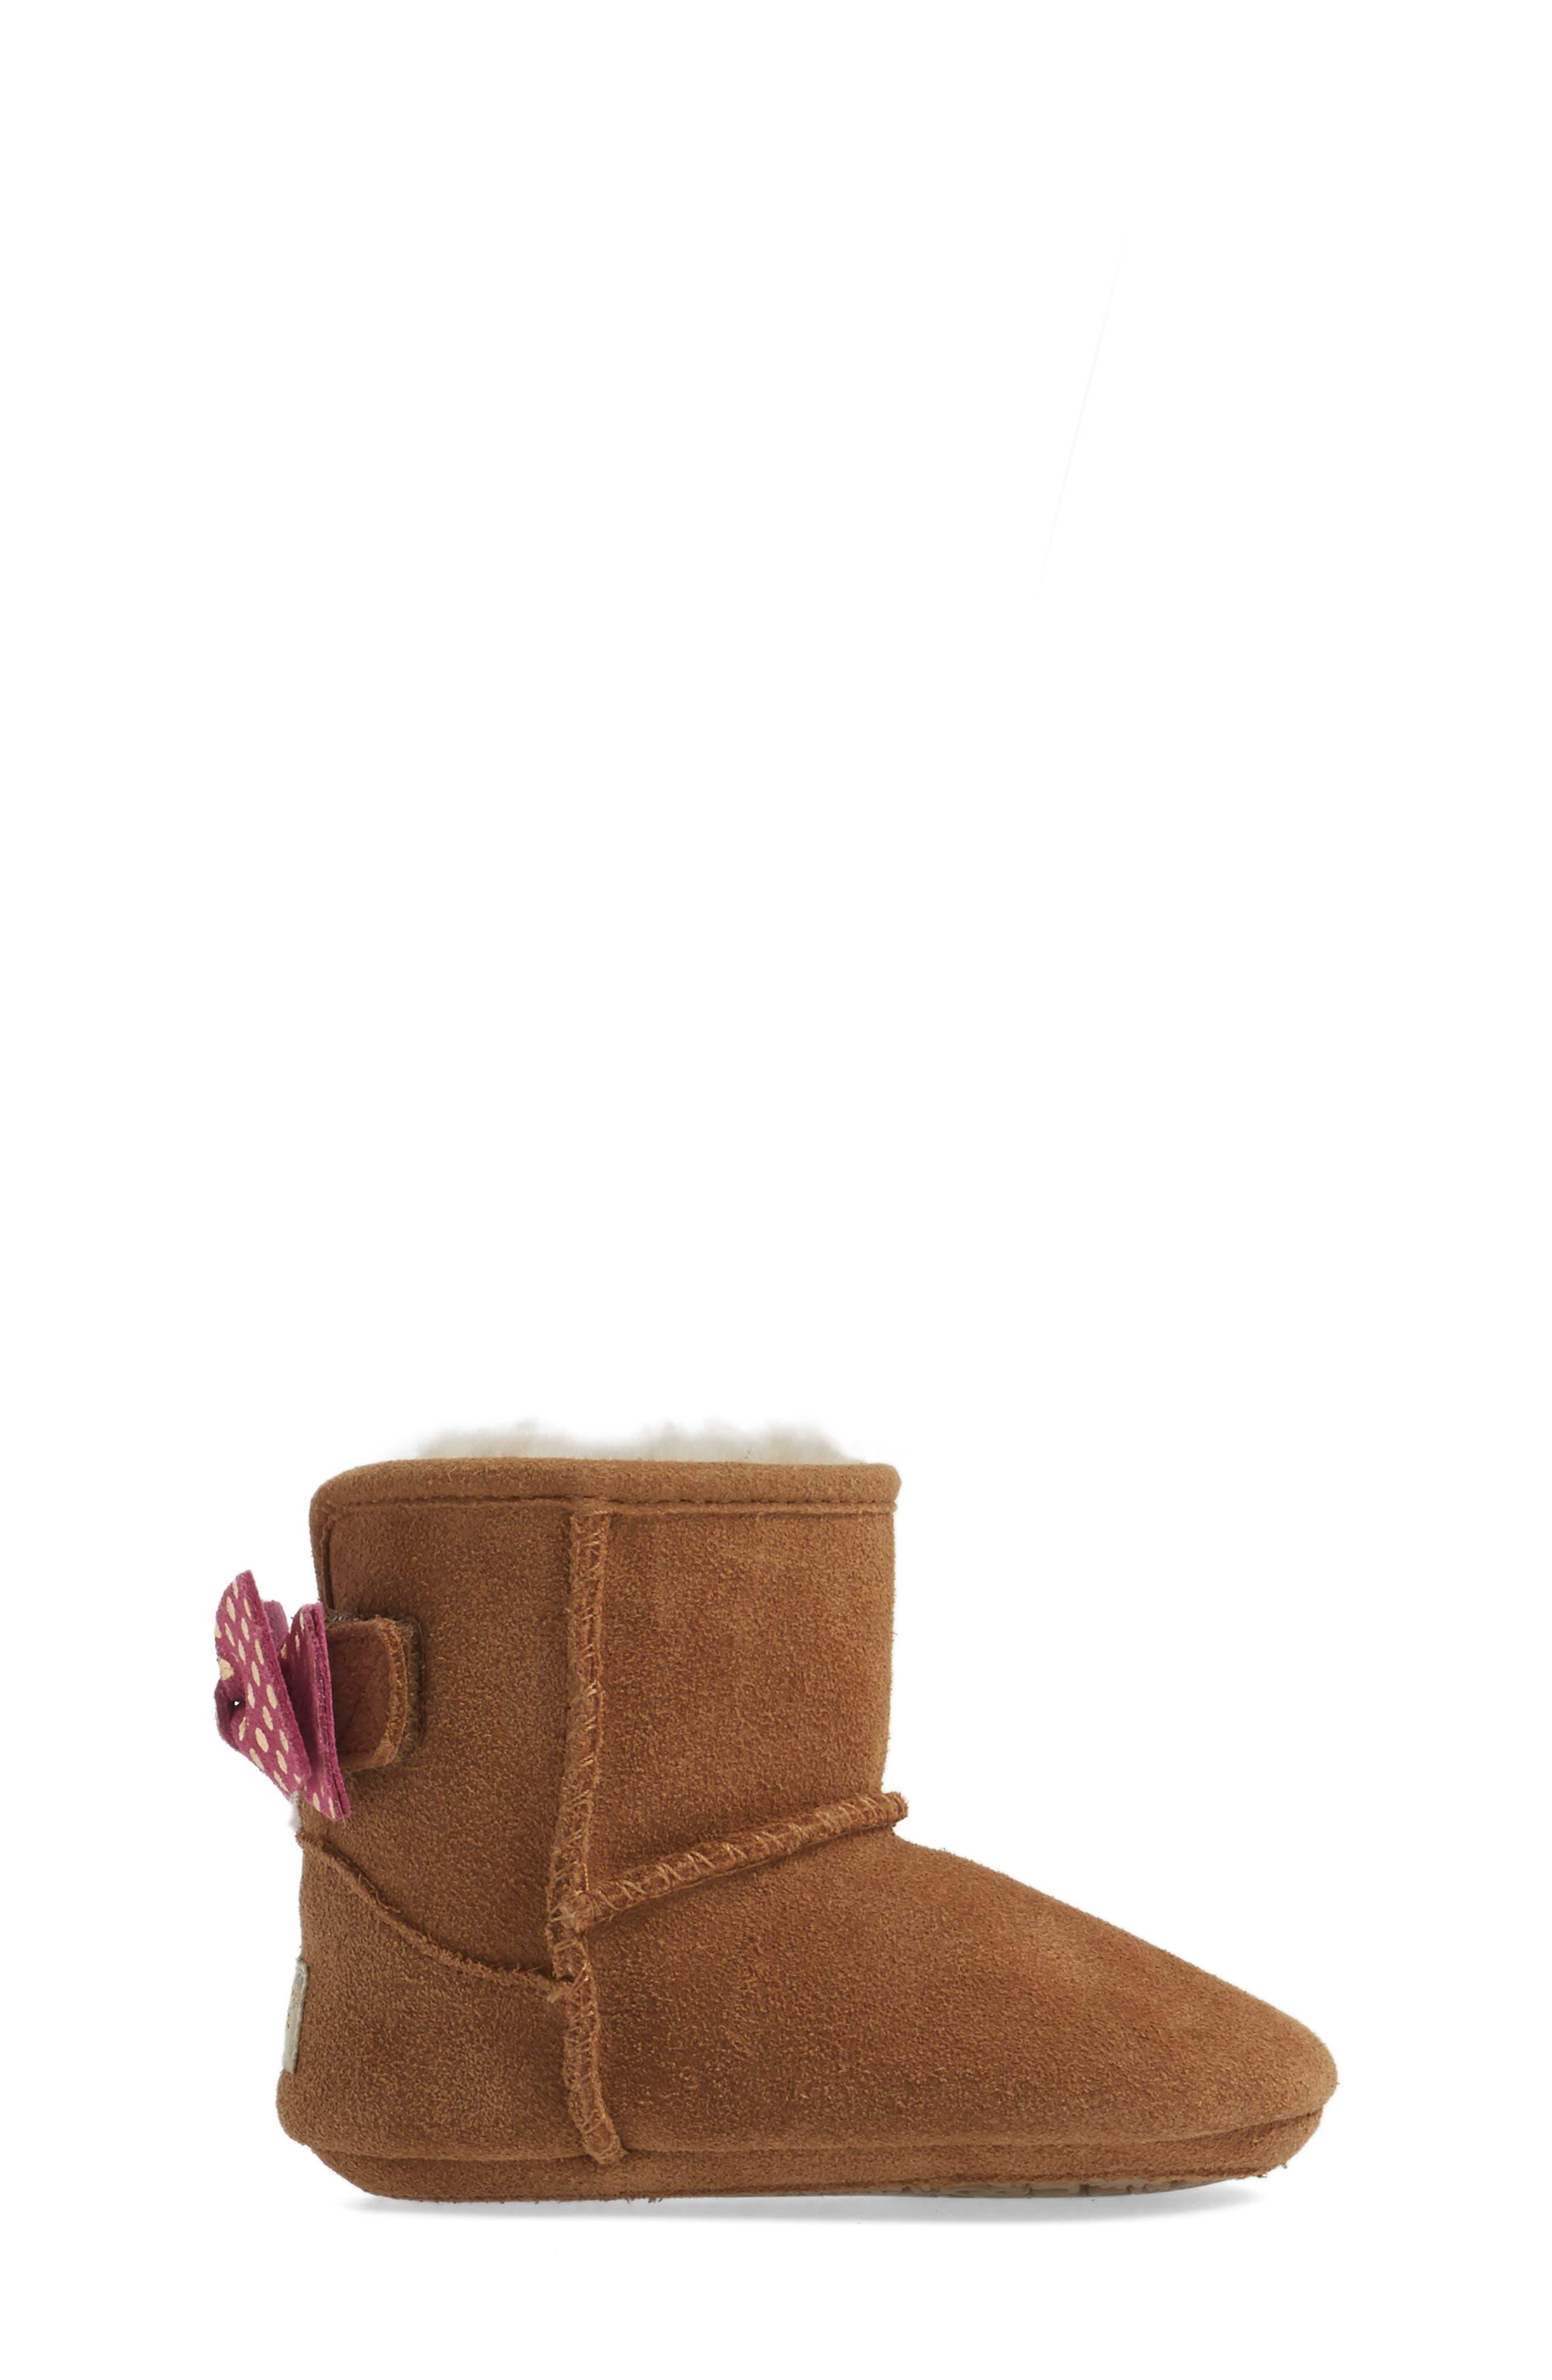 Alternate Image 3  - UGG® Jesse Bow II Dots Boot (Baby & Walker)